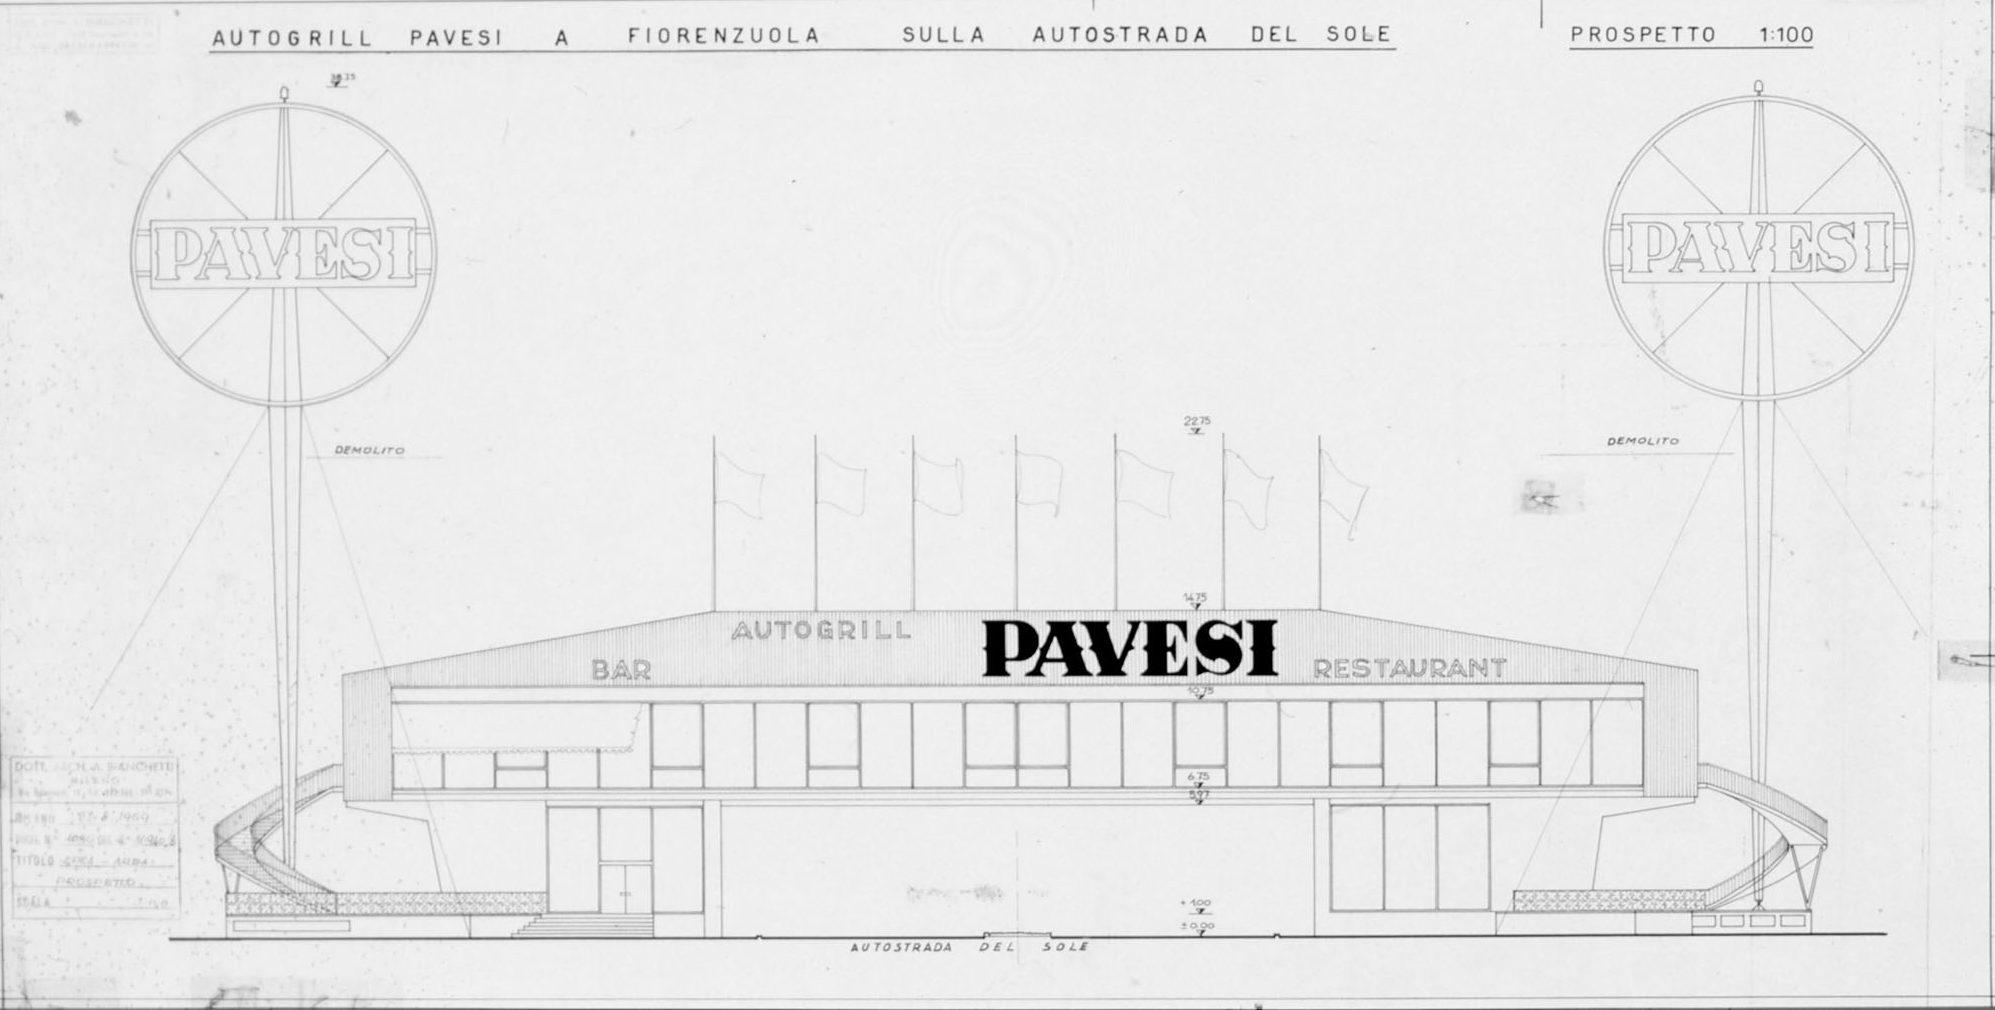 L Architettura Degli Autogrill Pavesi